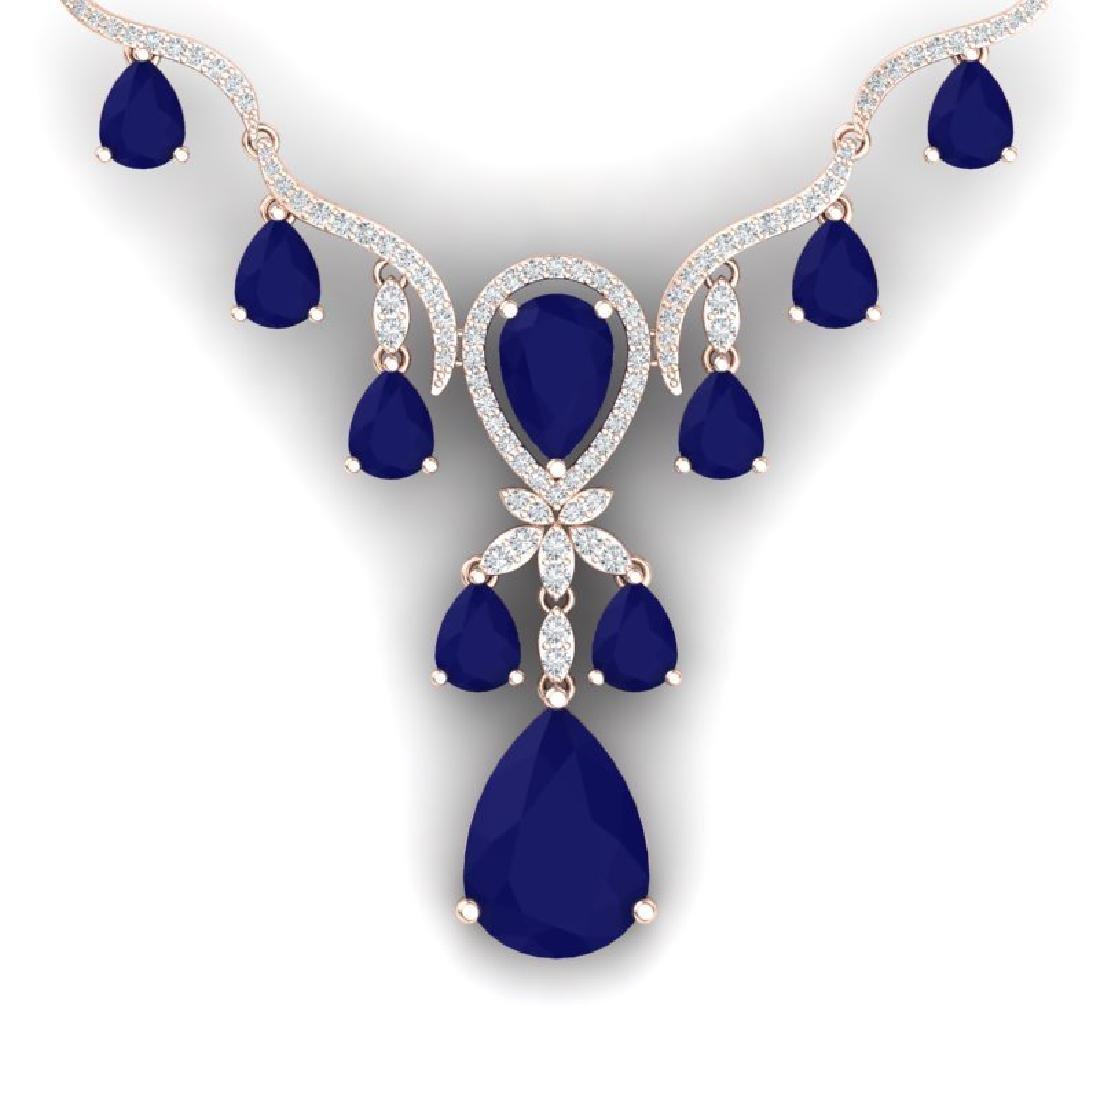 36.14 CTW Royalty Sapphire & VS Diamond Necklace 18K